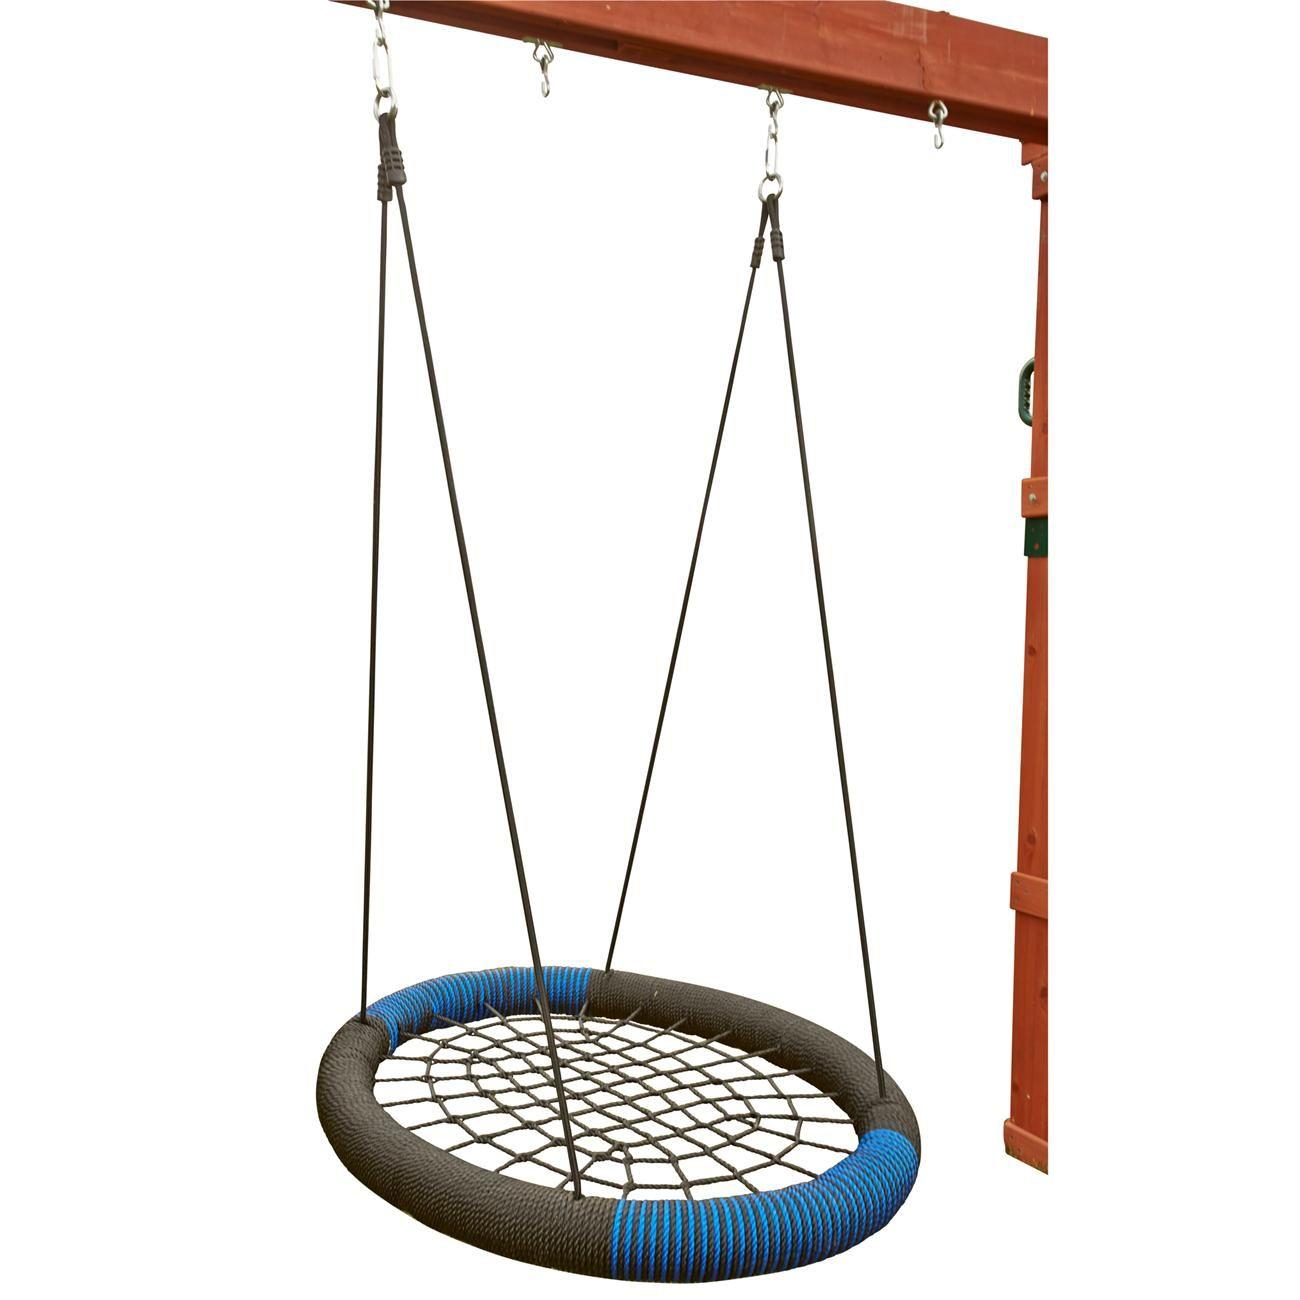 bungee cord chair diy yoga instructor training monster web swing outside entertaining pinterest